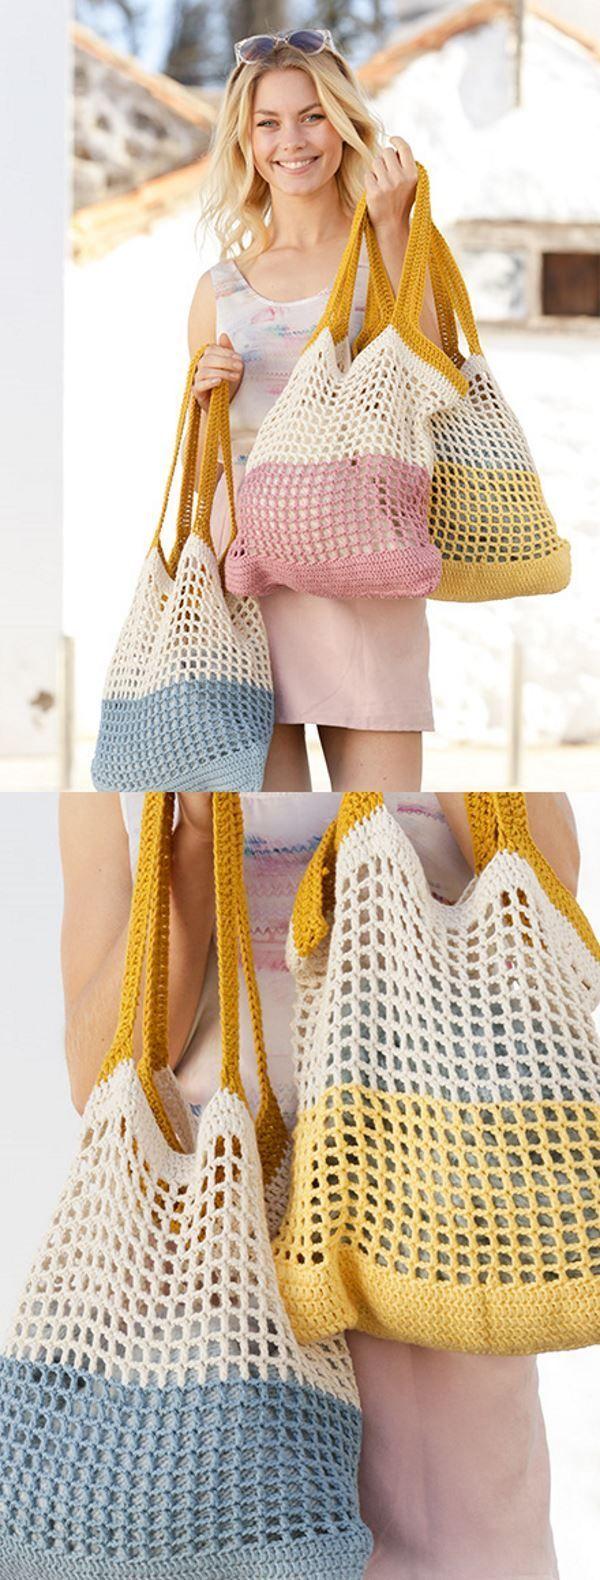 Free Crochet Pattern for a Beach Bag #amigurumi #crochet #knitting #amigurumi p…